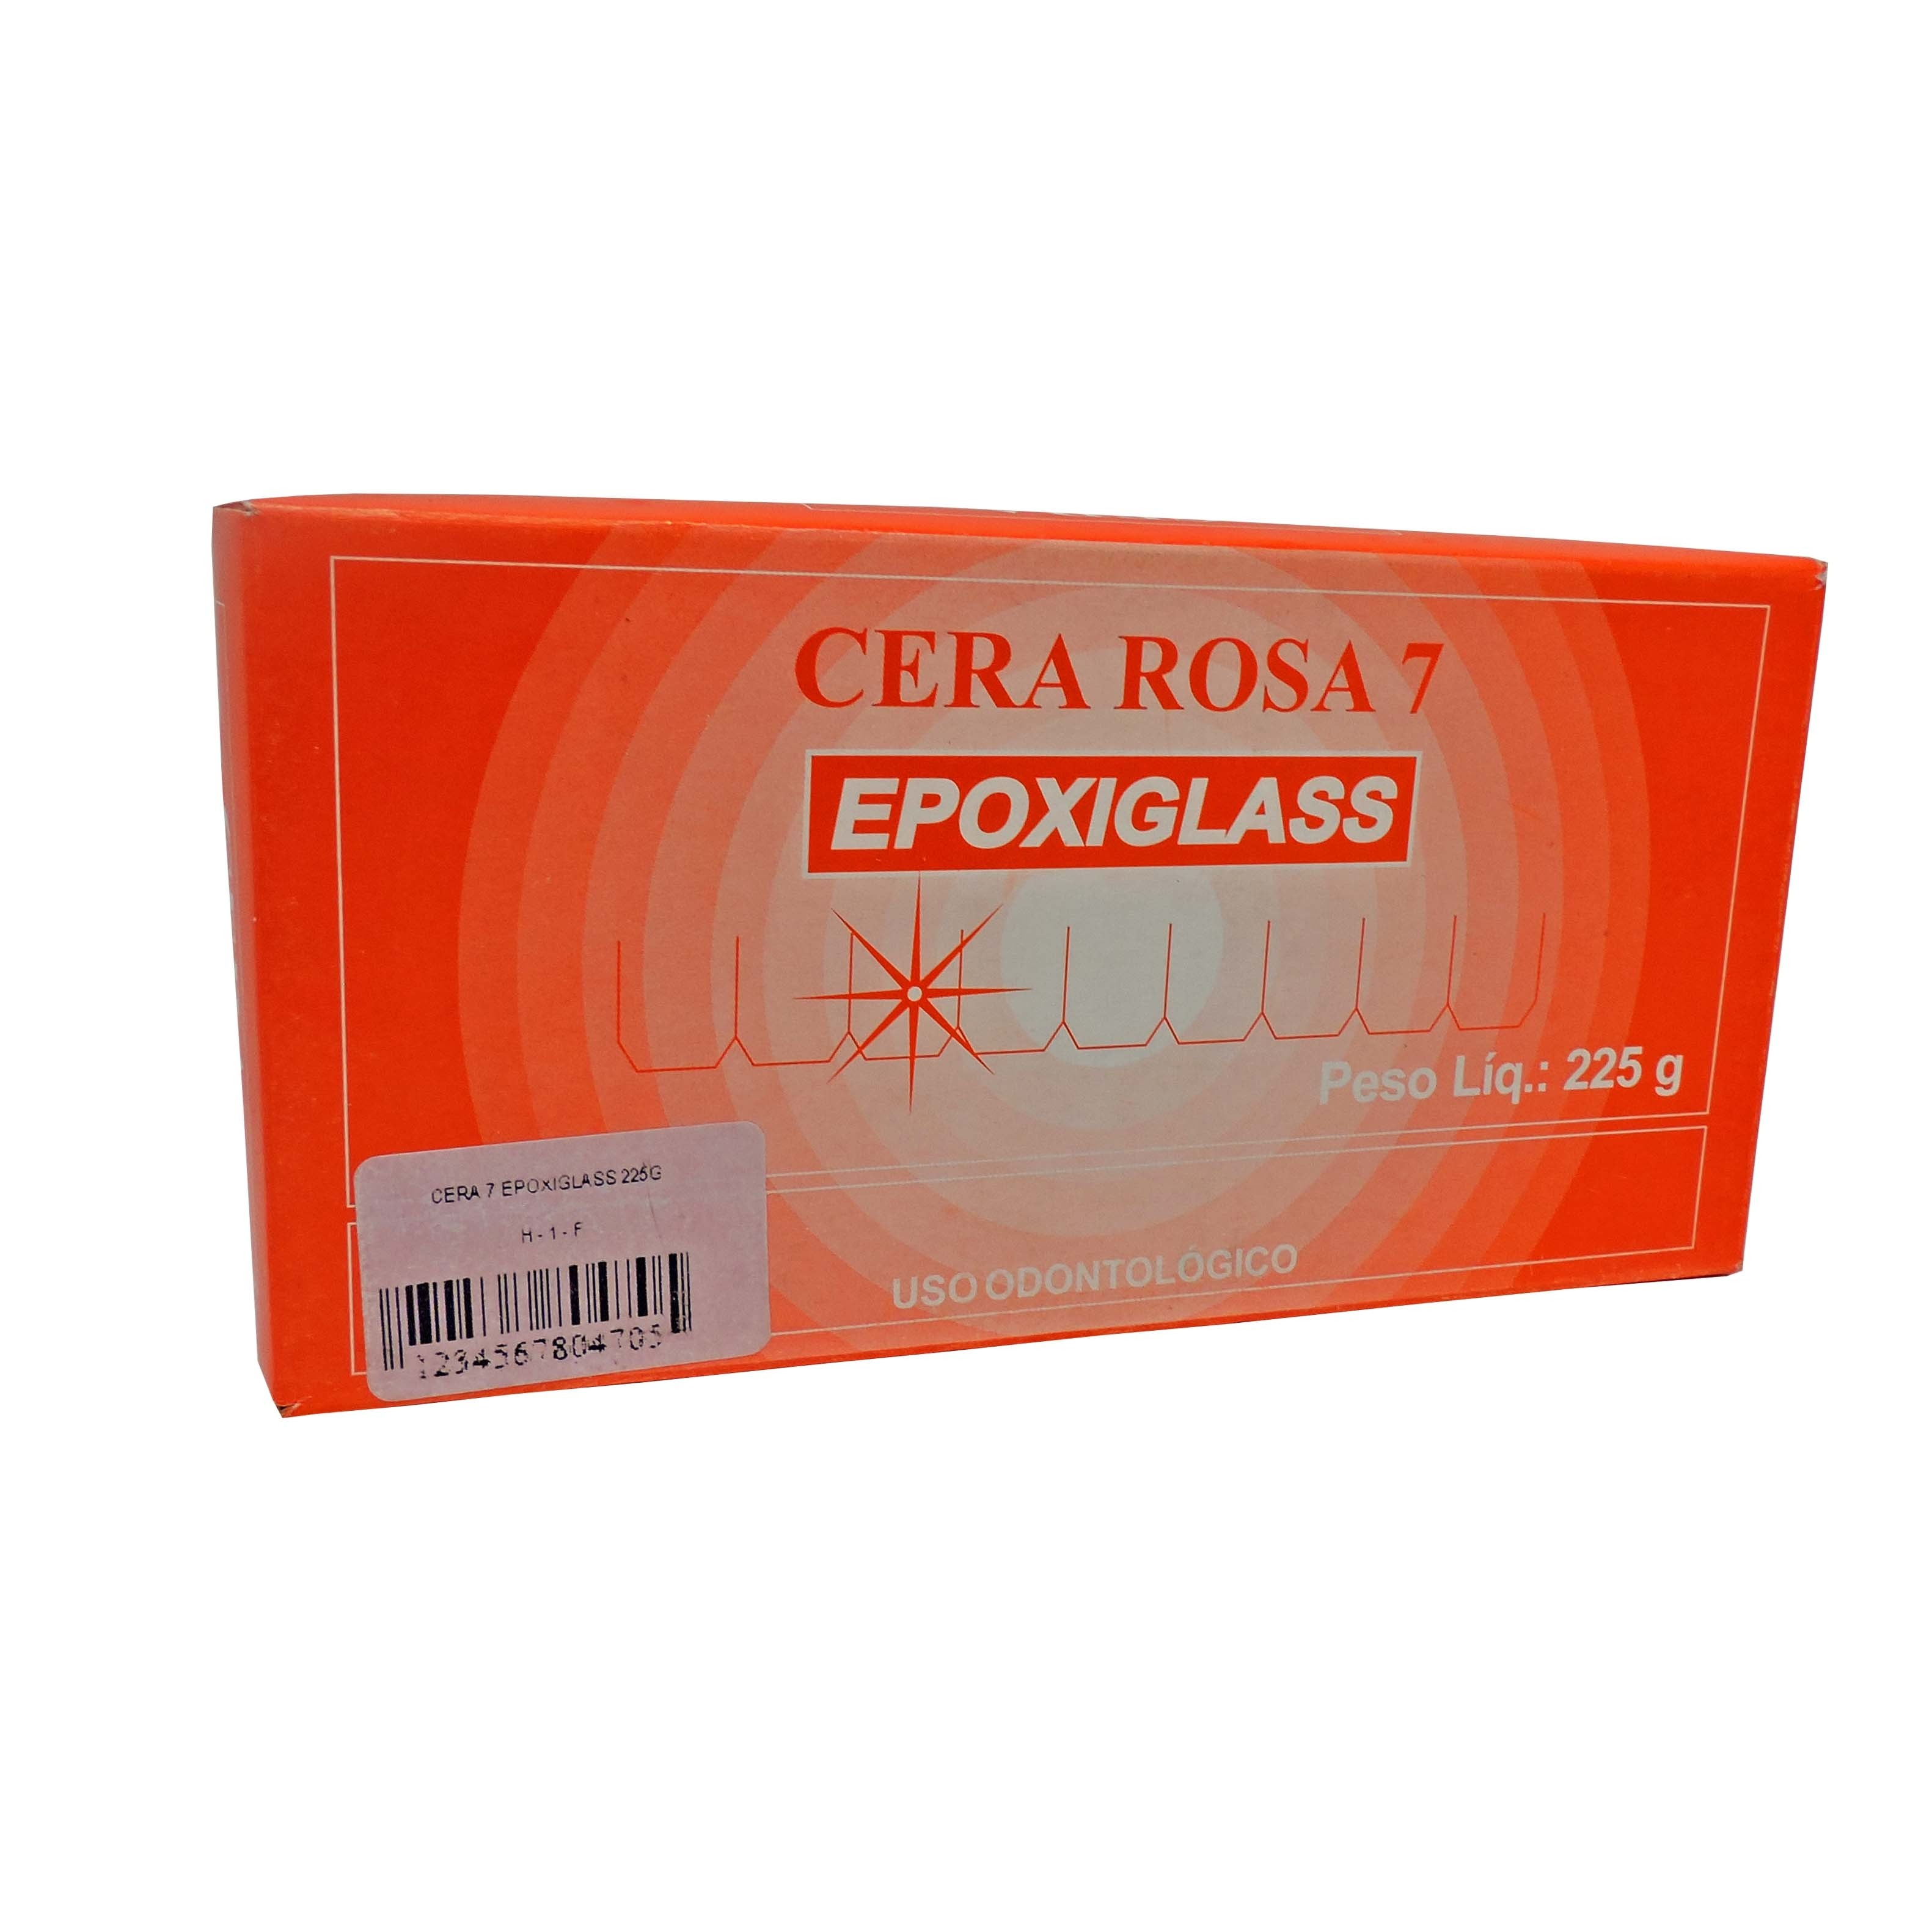 Cera Rosa 7 Epoxiglass 225grs